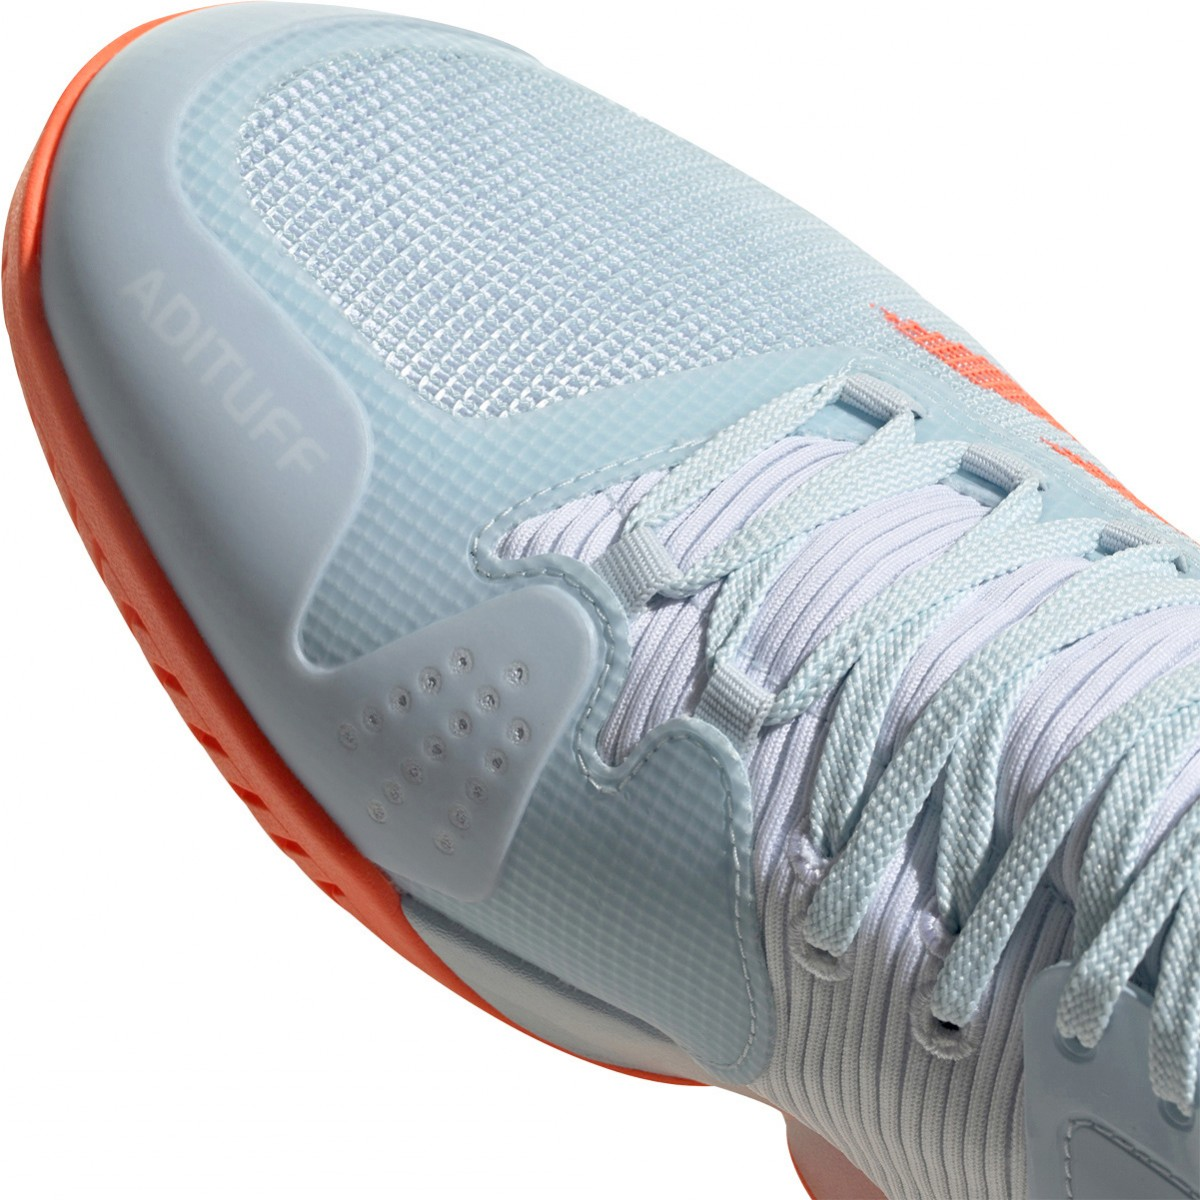 Chaussures Homme adidas adizero Ubersonic 3 Edberg L.E.